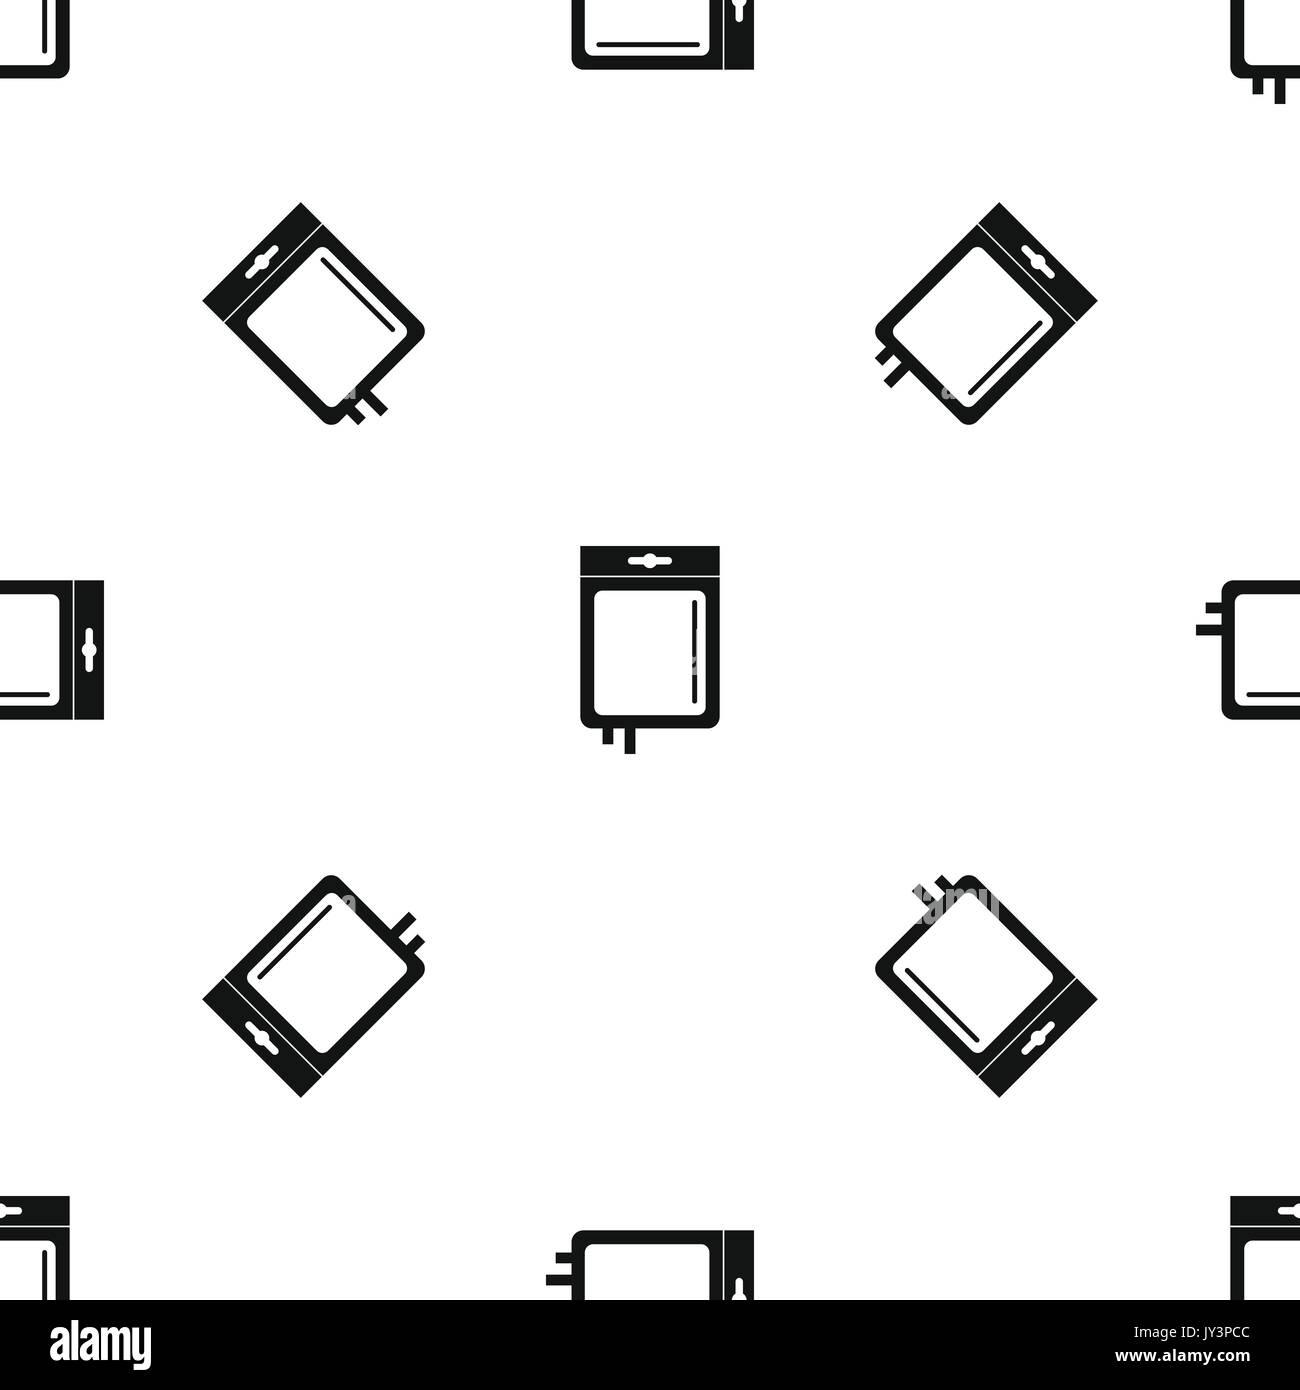 Blood transfusion pattern seamless black - Stock Image